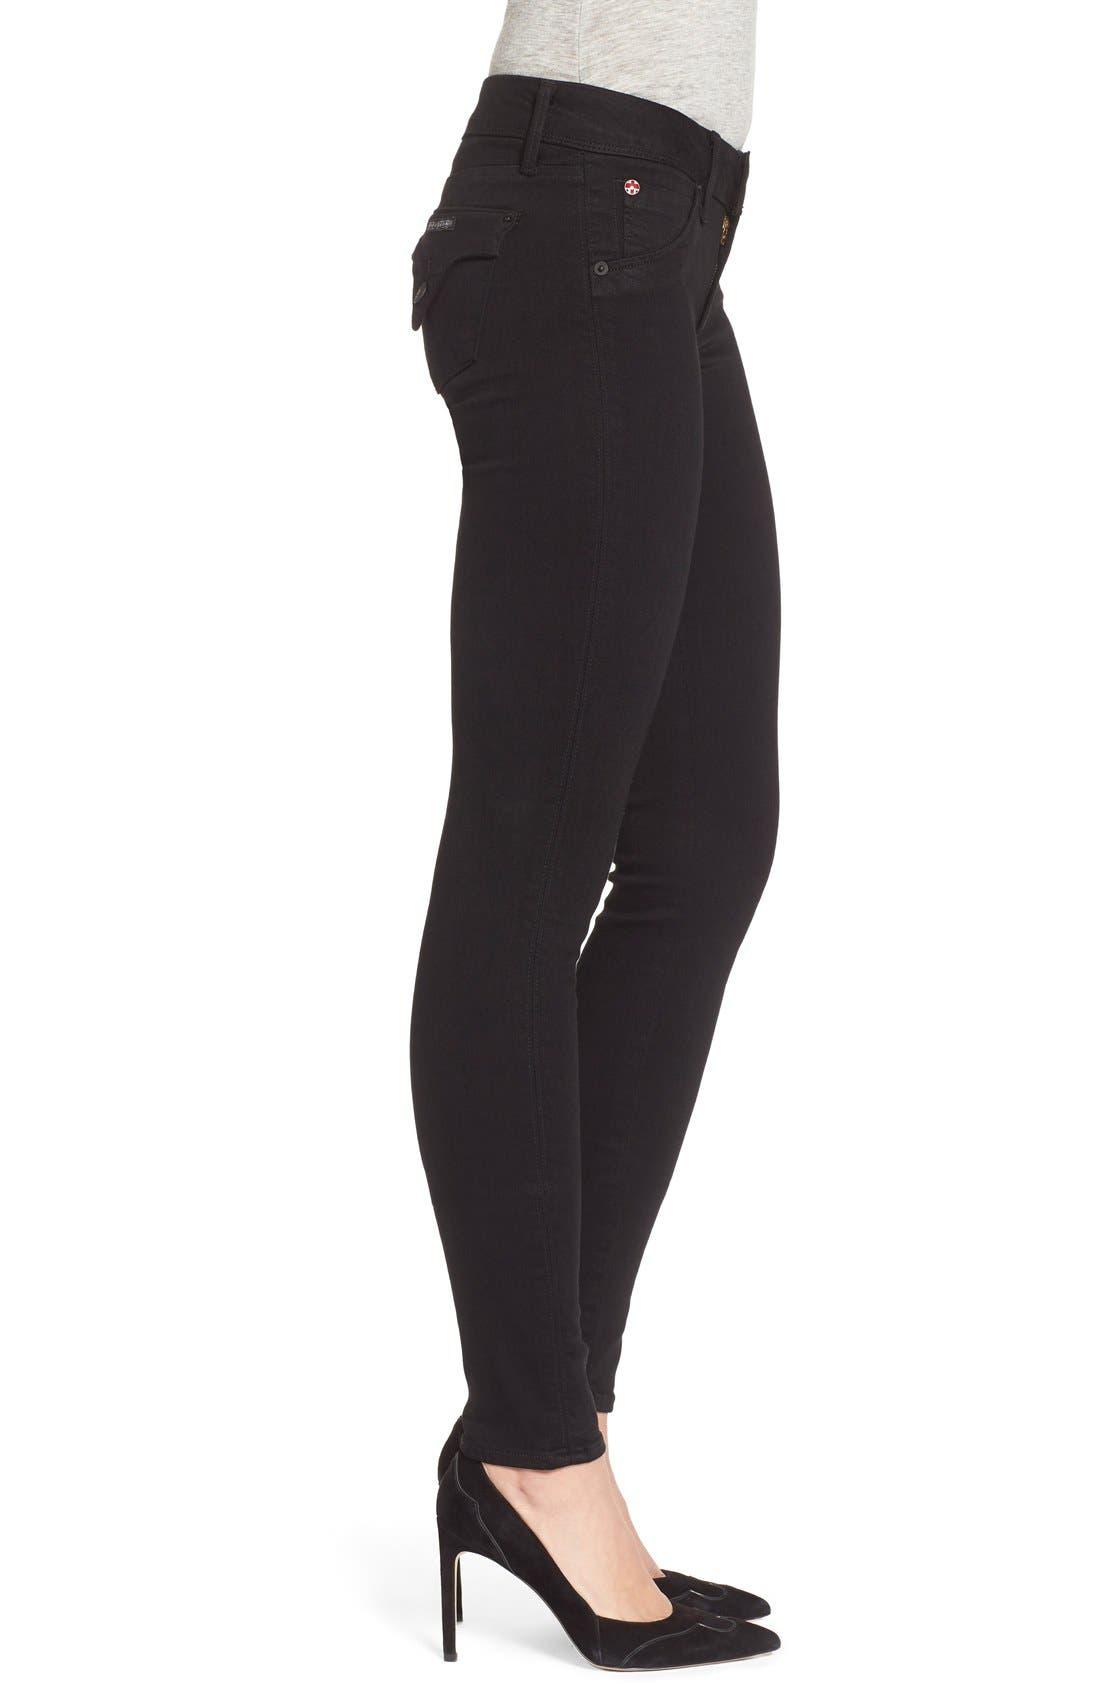 Alternate Image 3  - Hudson Jeans 'Collin' Supermodel Skinny Jeans (Black) (Long)